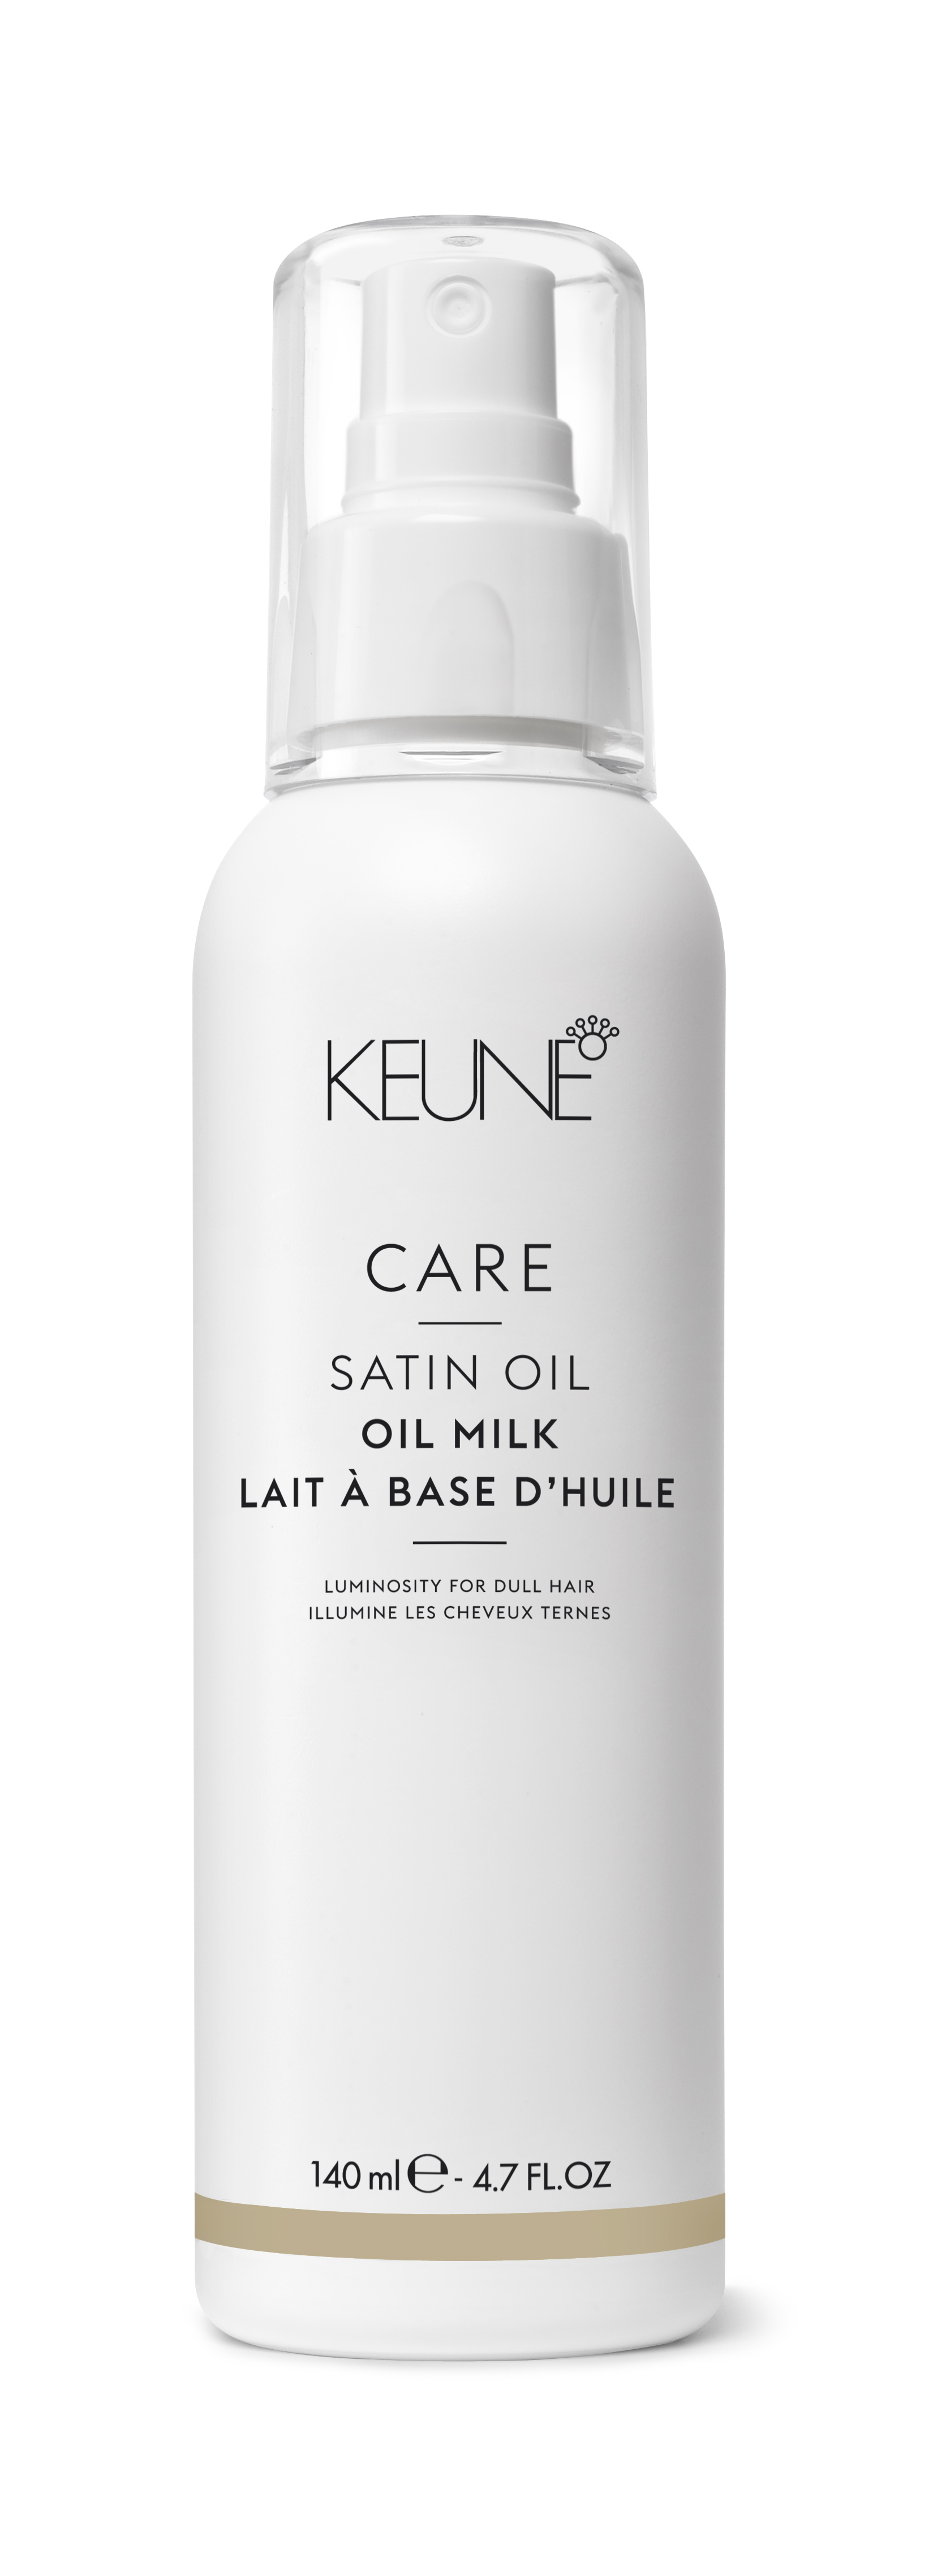 KEUNE Масло-молочко для волос Шелковый уход / CARE Satin Oil  Oil Milk 140 мл - Молочко